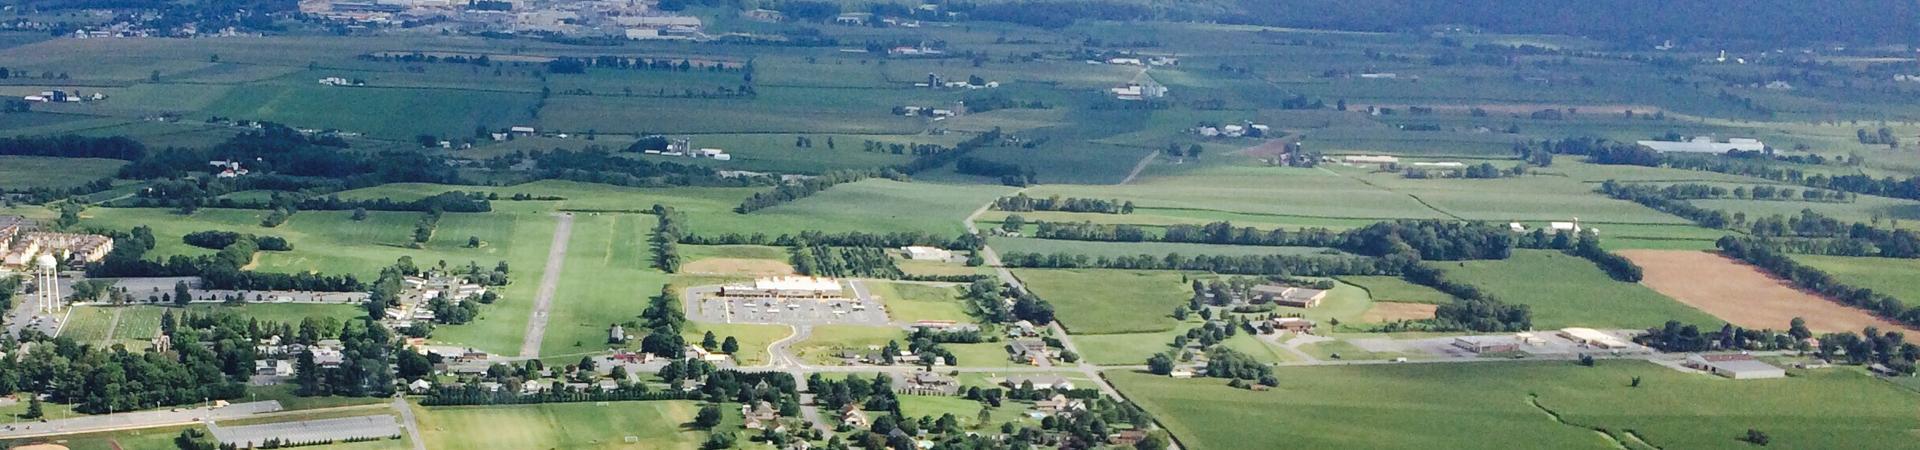 Landscape of Jessup, PA